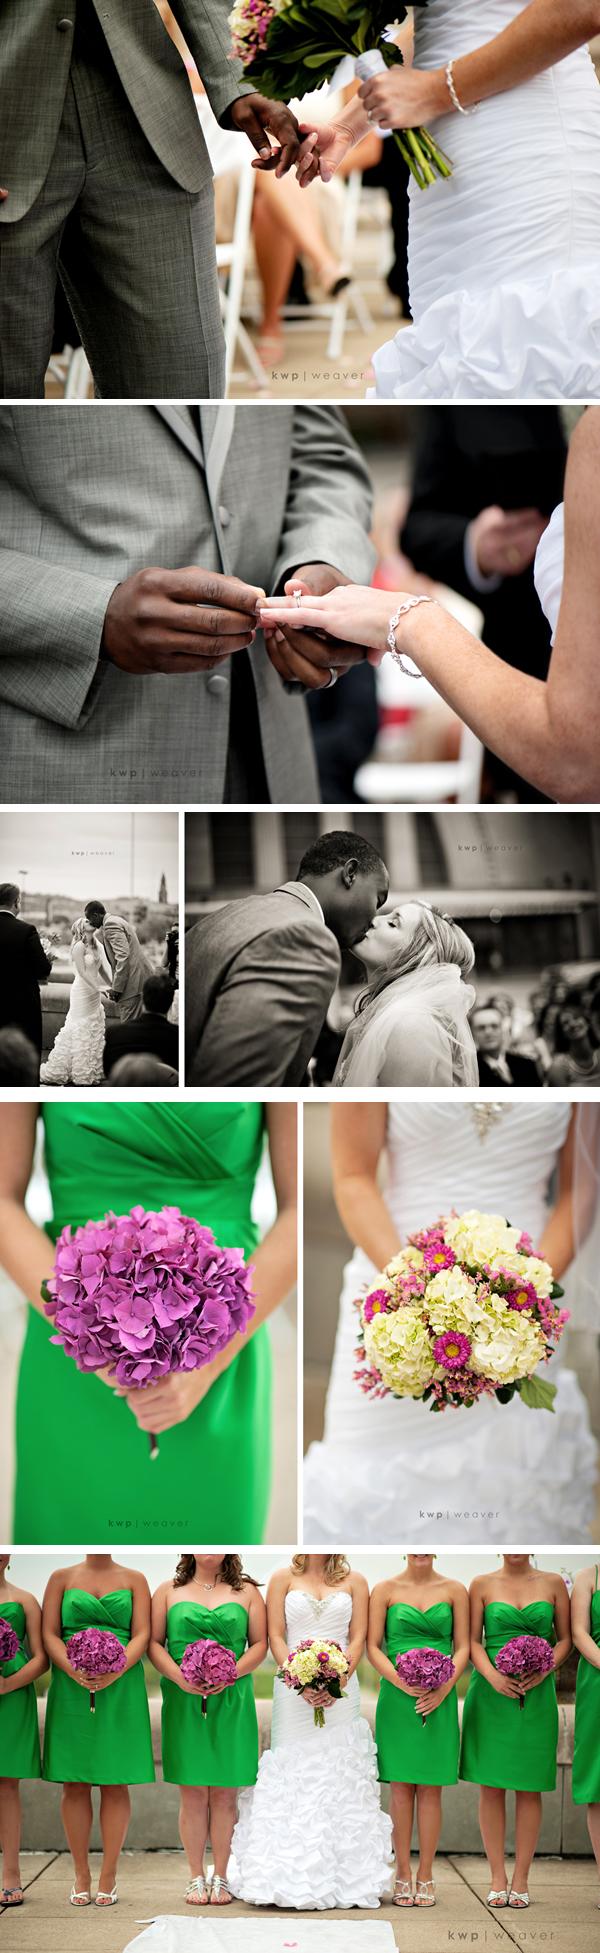 Kristen Weaver Photography - Orlando Wedding Photography